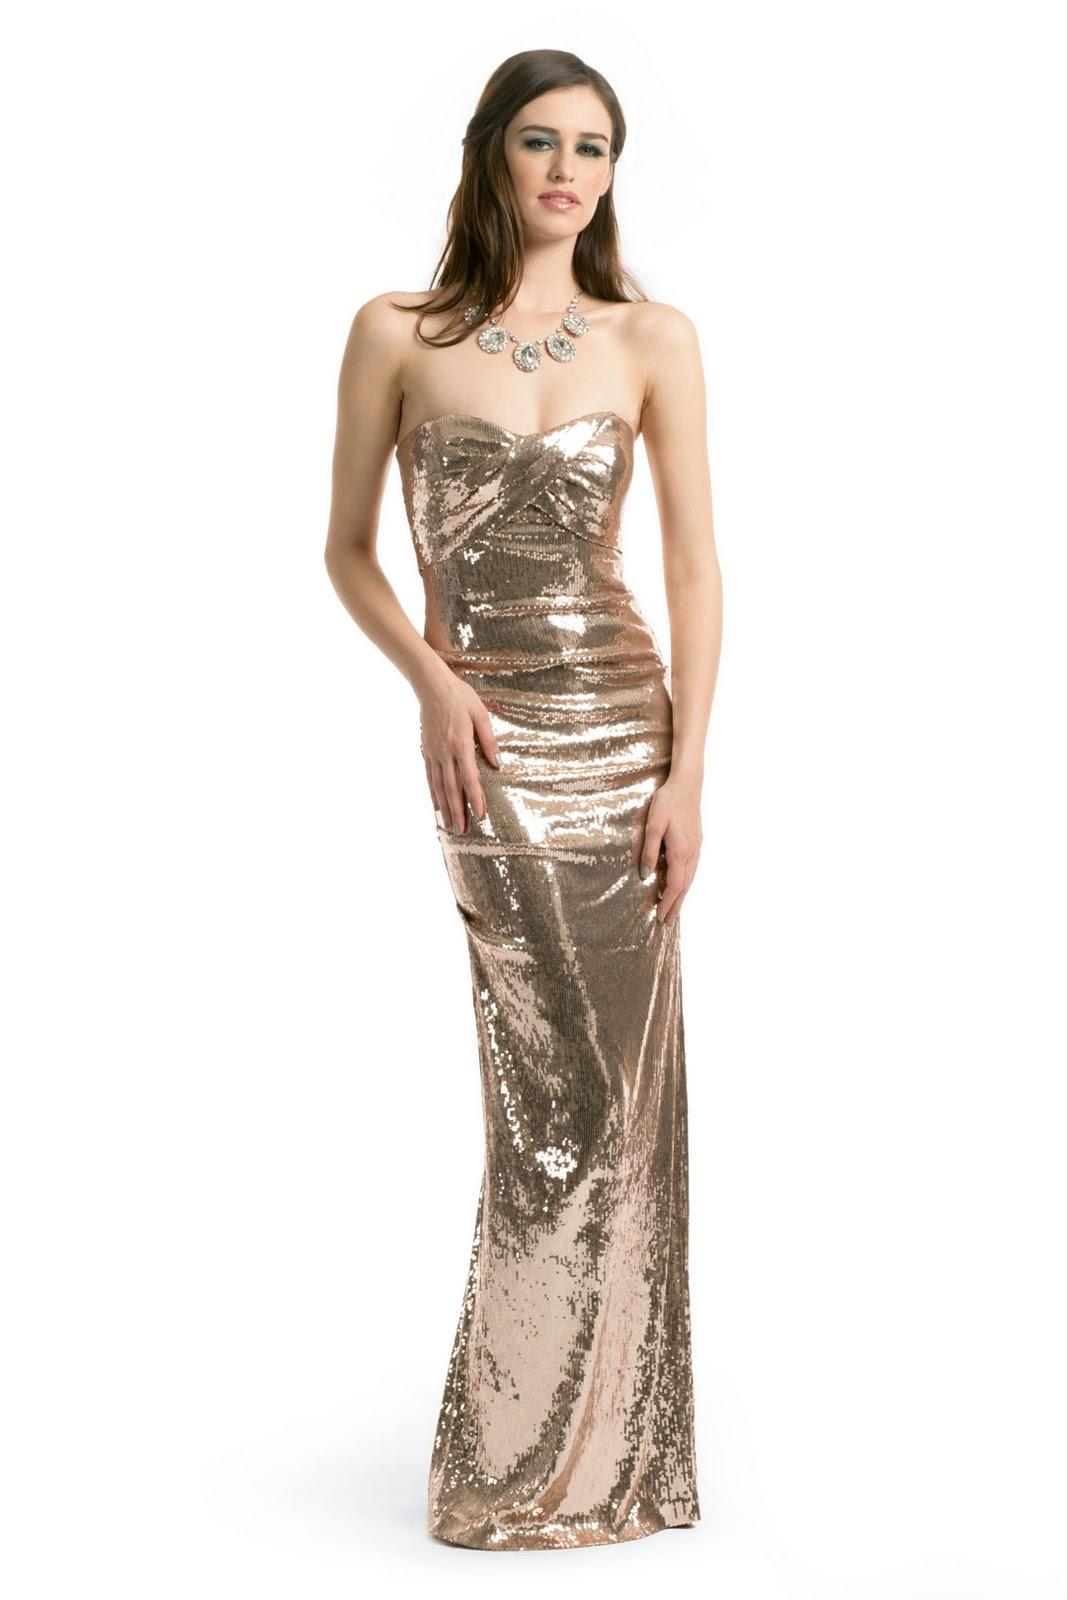 http://1.bp.blogspot.com/-T8oXKaqRp6E/TyVsJJk5yCI/AAAAAAAAByk/_KNU1T44SFk/s1600/dress_nicole_miller_such_a_sweetheart_gown_0.jpg